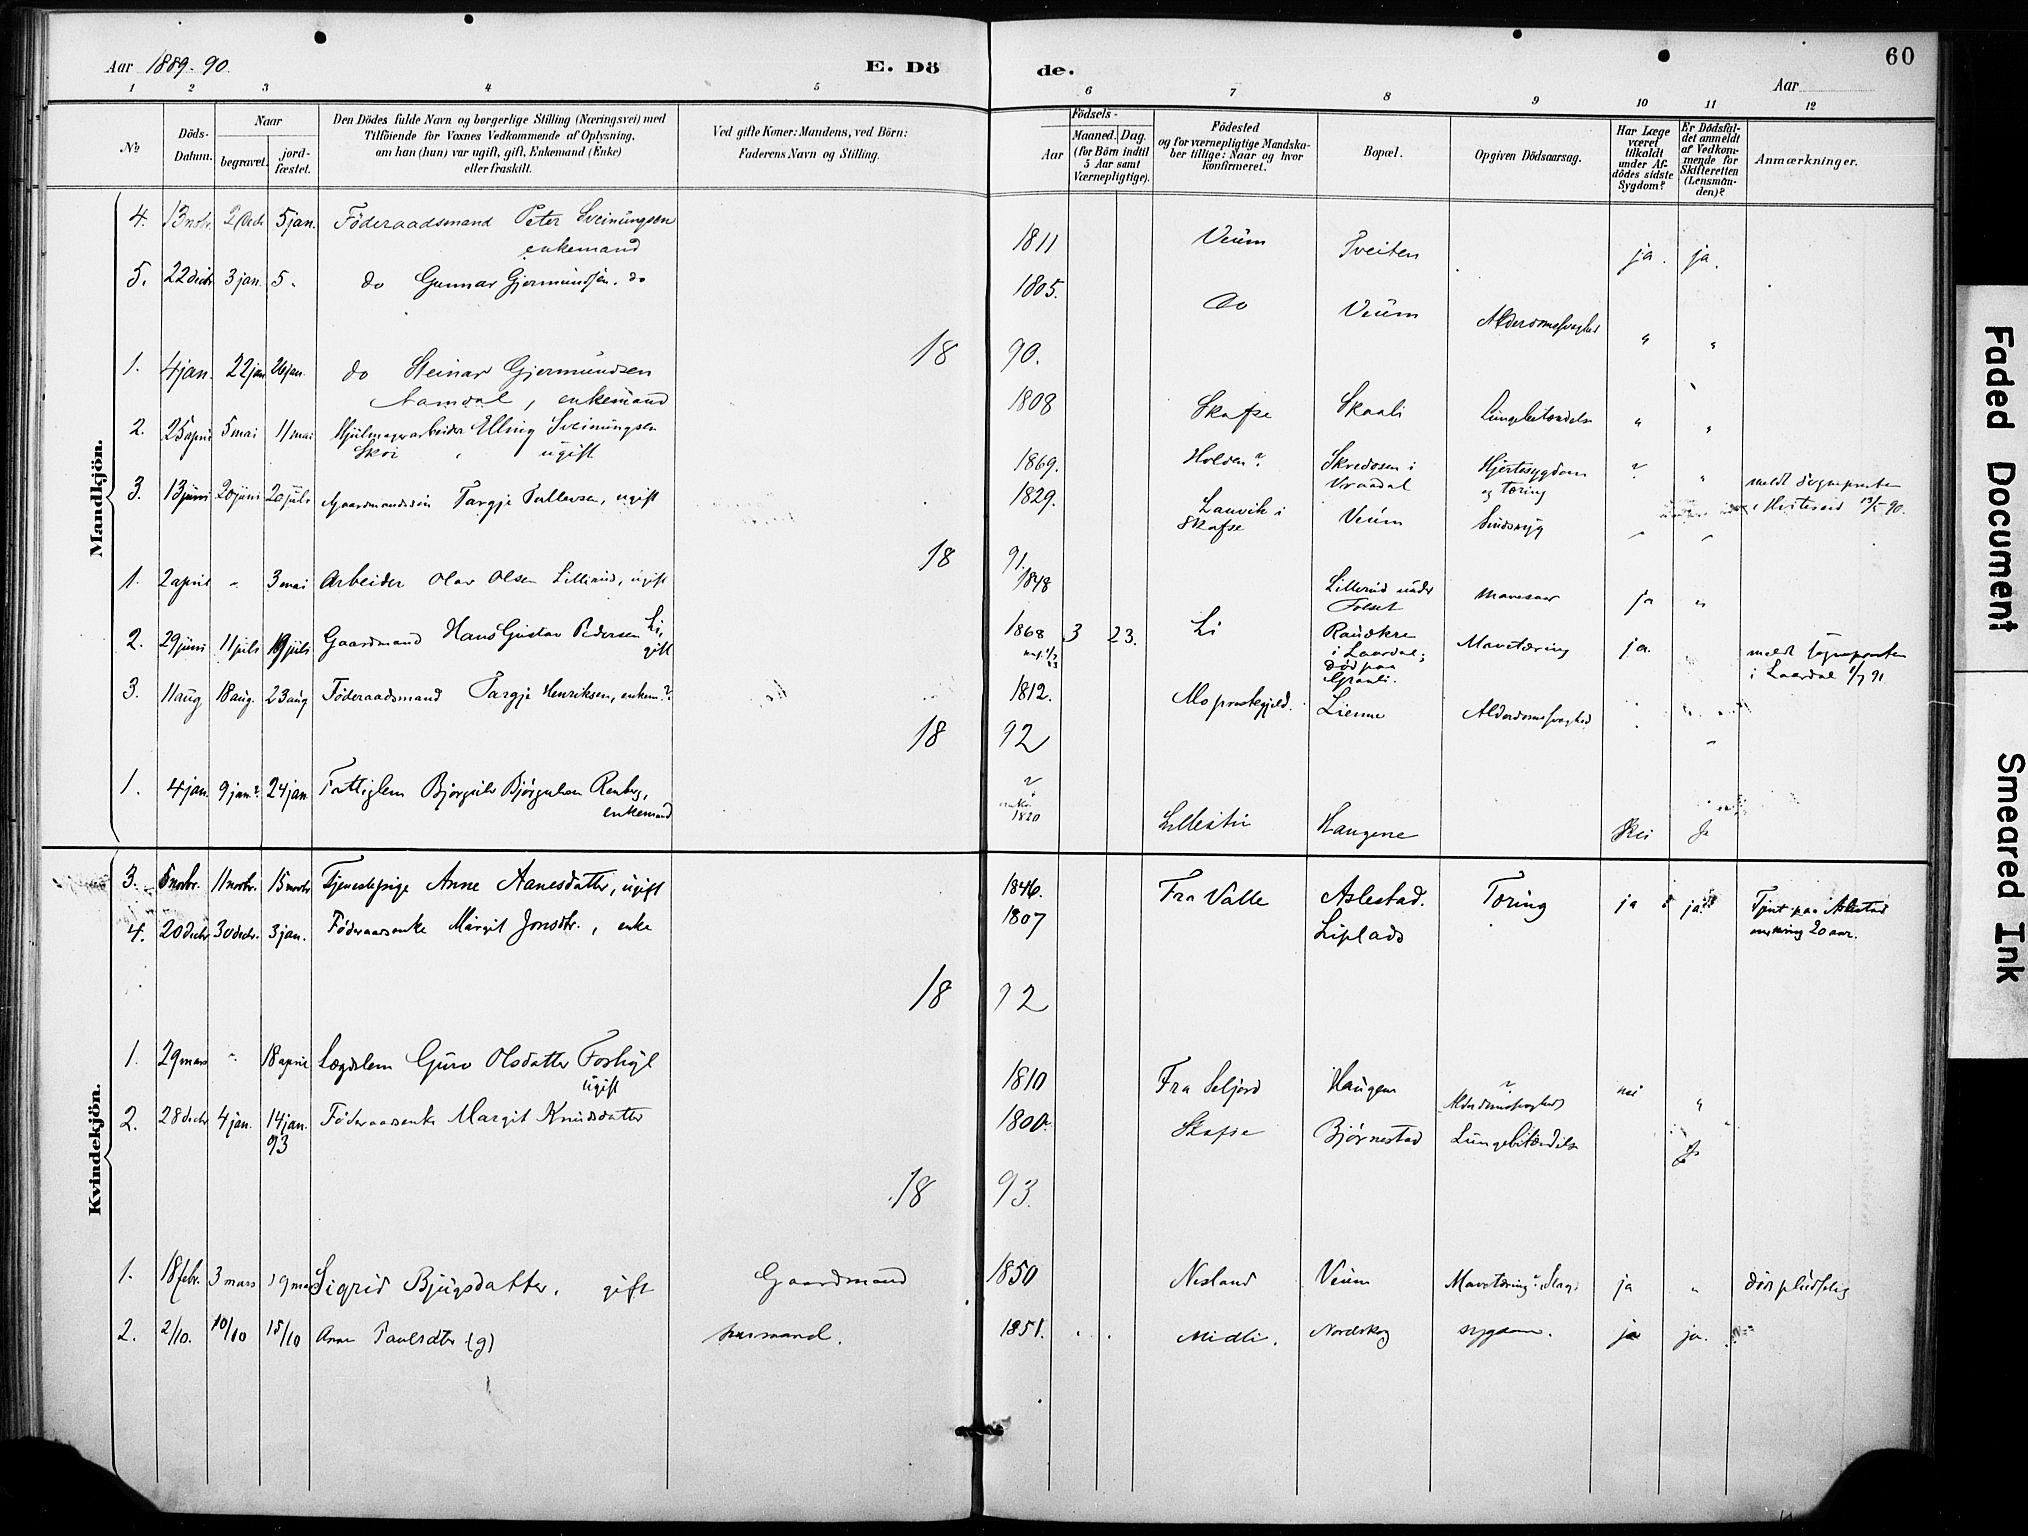 SAKO, Fyresdal kirkebøker, F/Fb/L0003: Ministerialbok nr. II 3, 1887-1903, s. 60